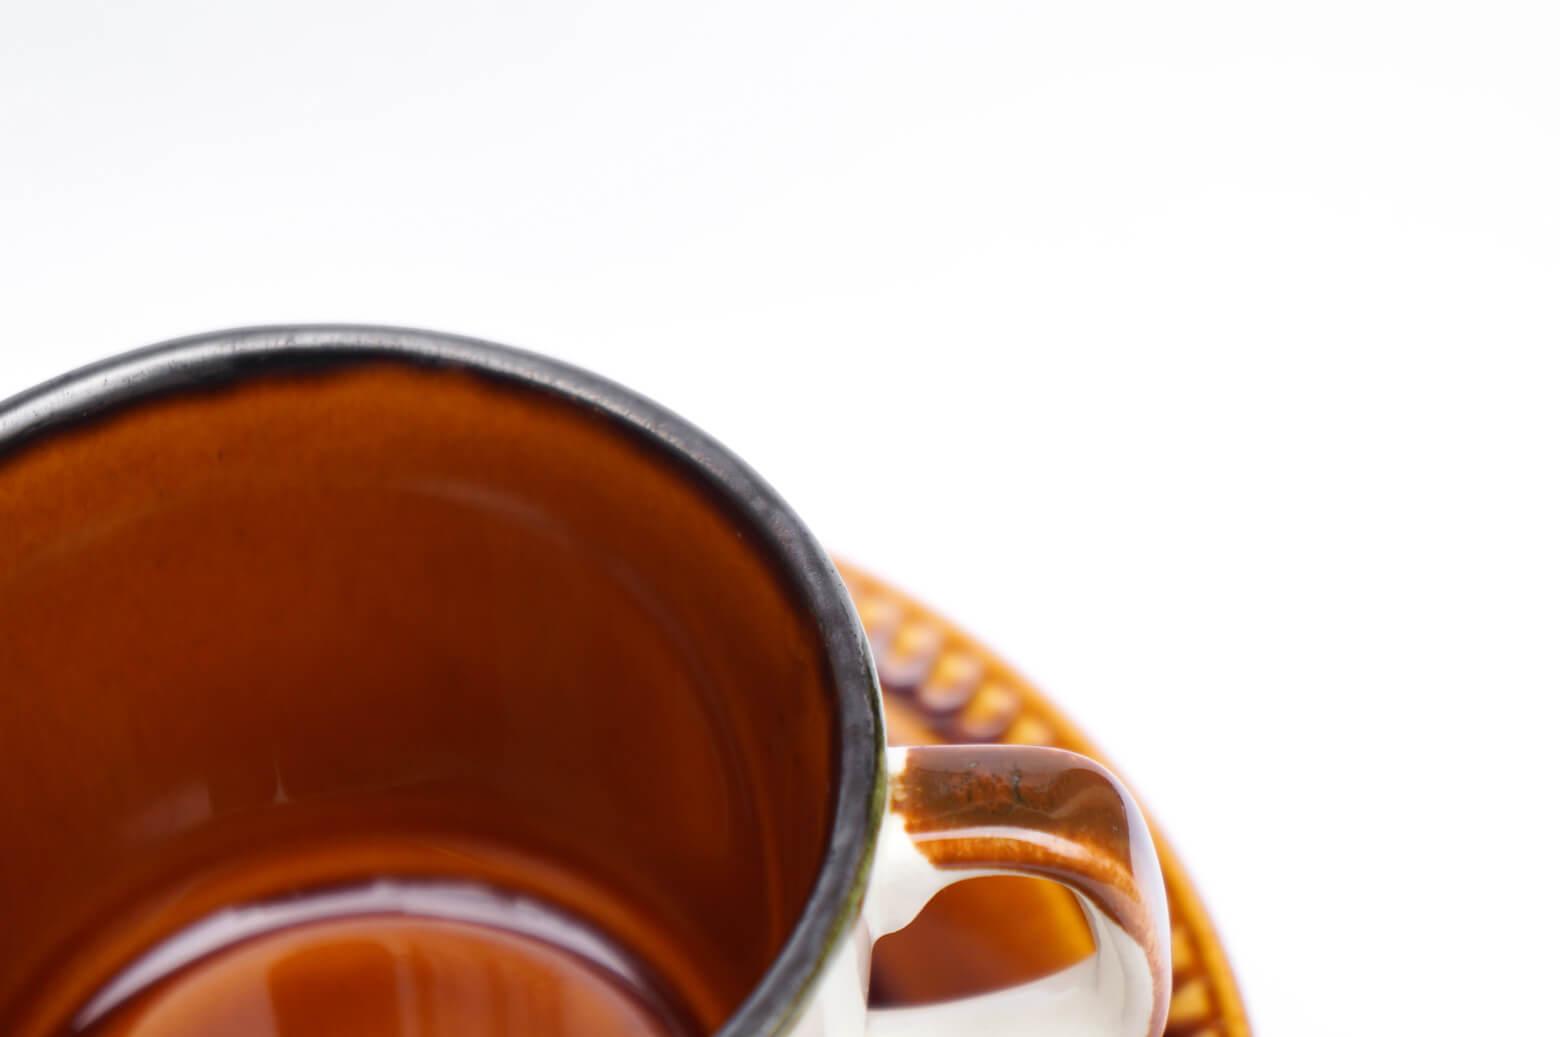 Boch Cup and Saucer Rambouillet / ボッホ カップ アンド ソーサー ランブイエ ヴィンテージ 食器 ベルギー 雑貨